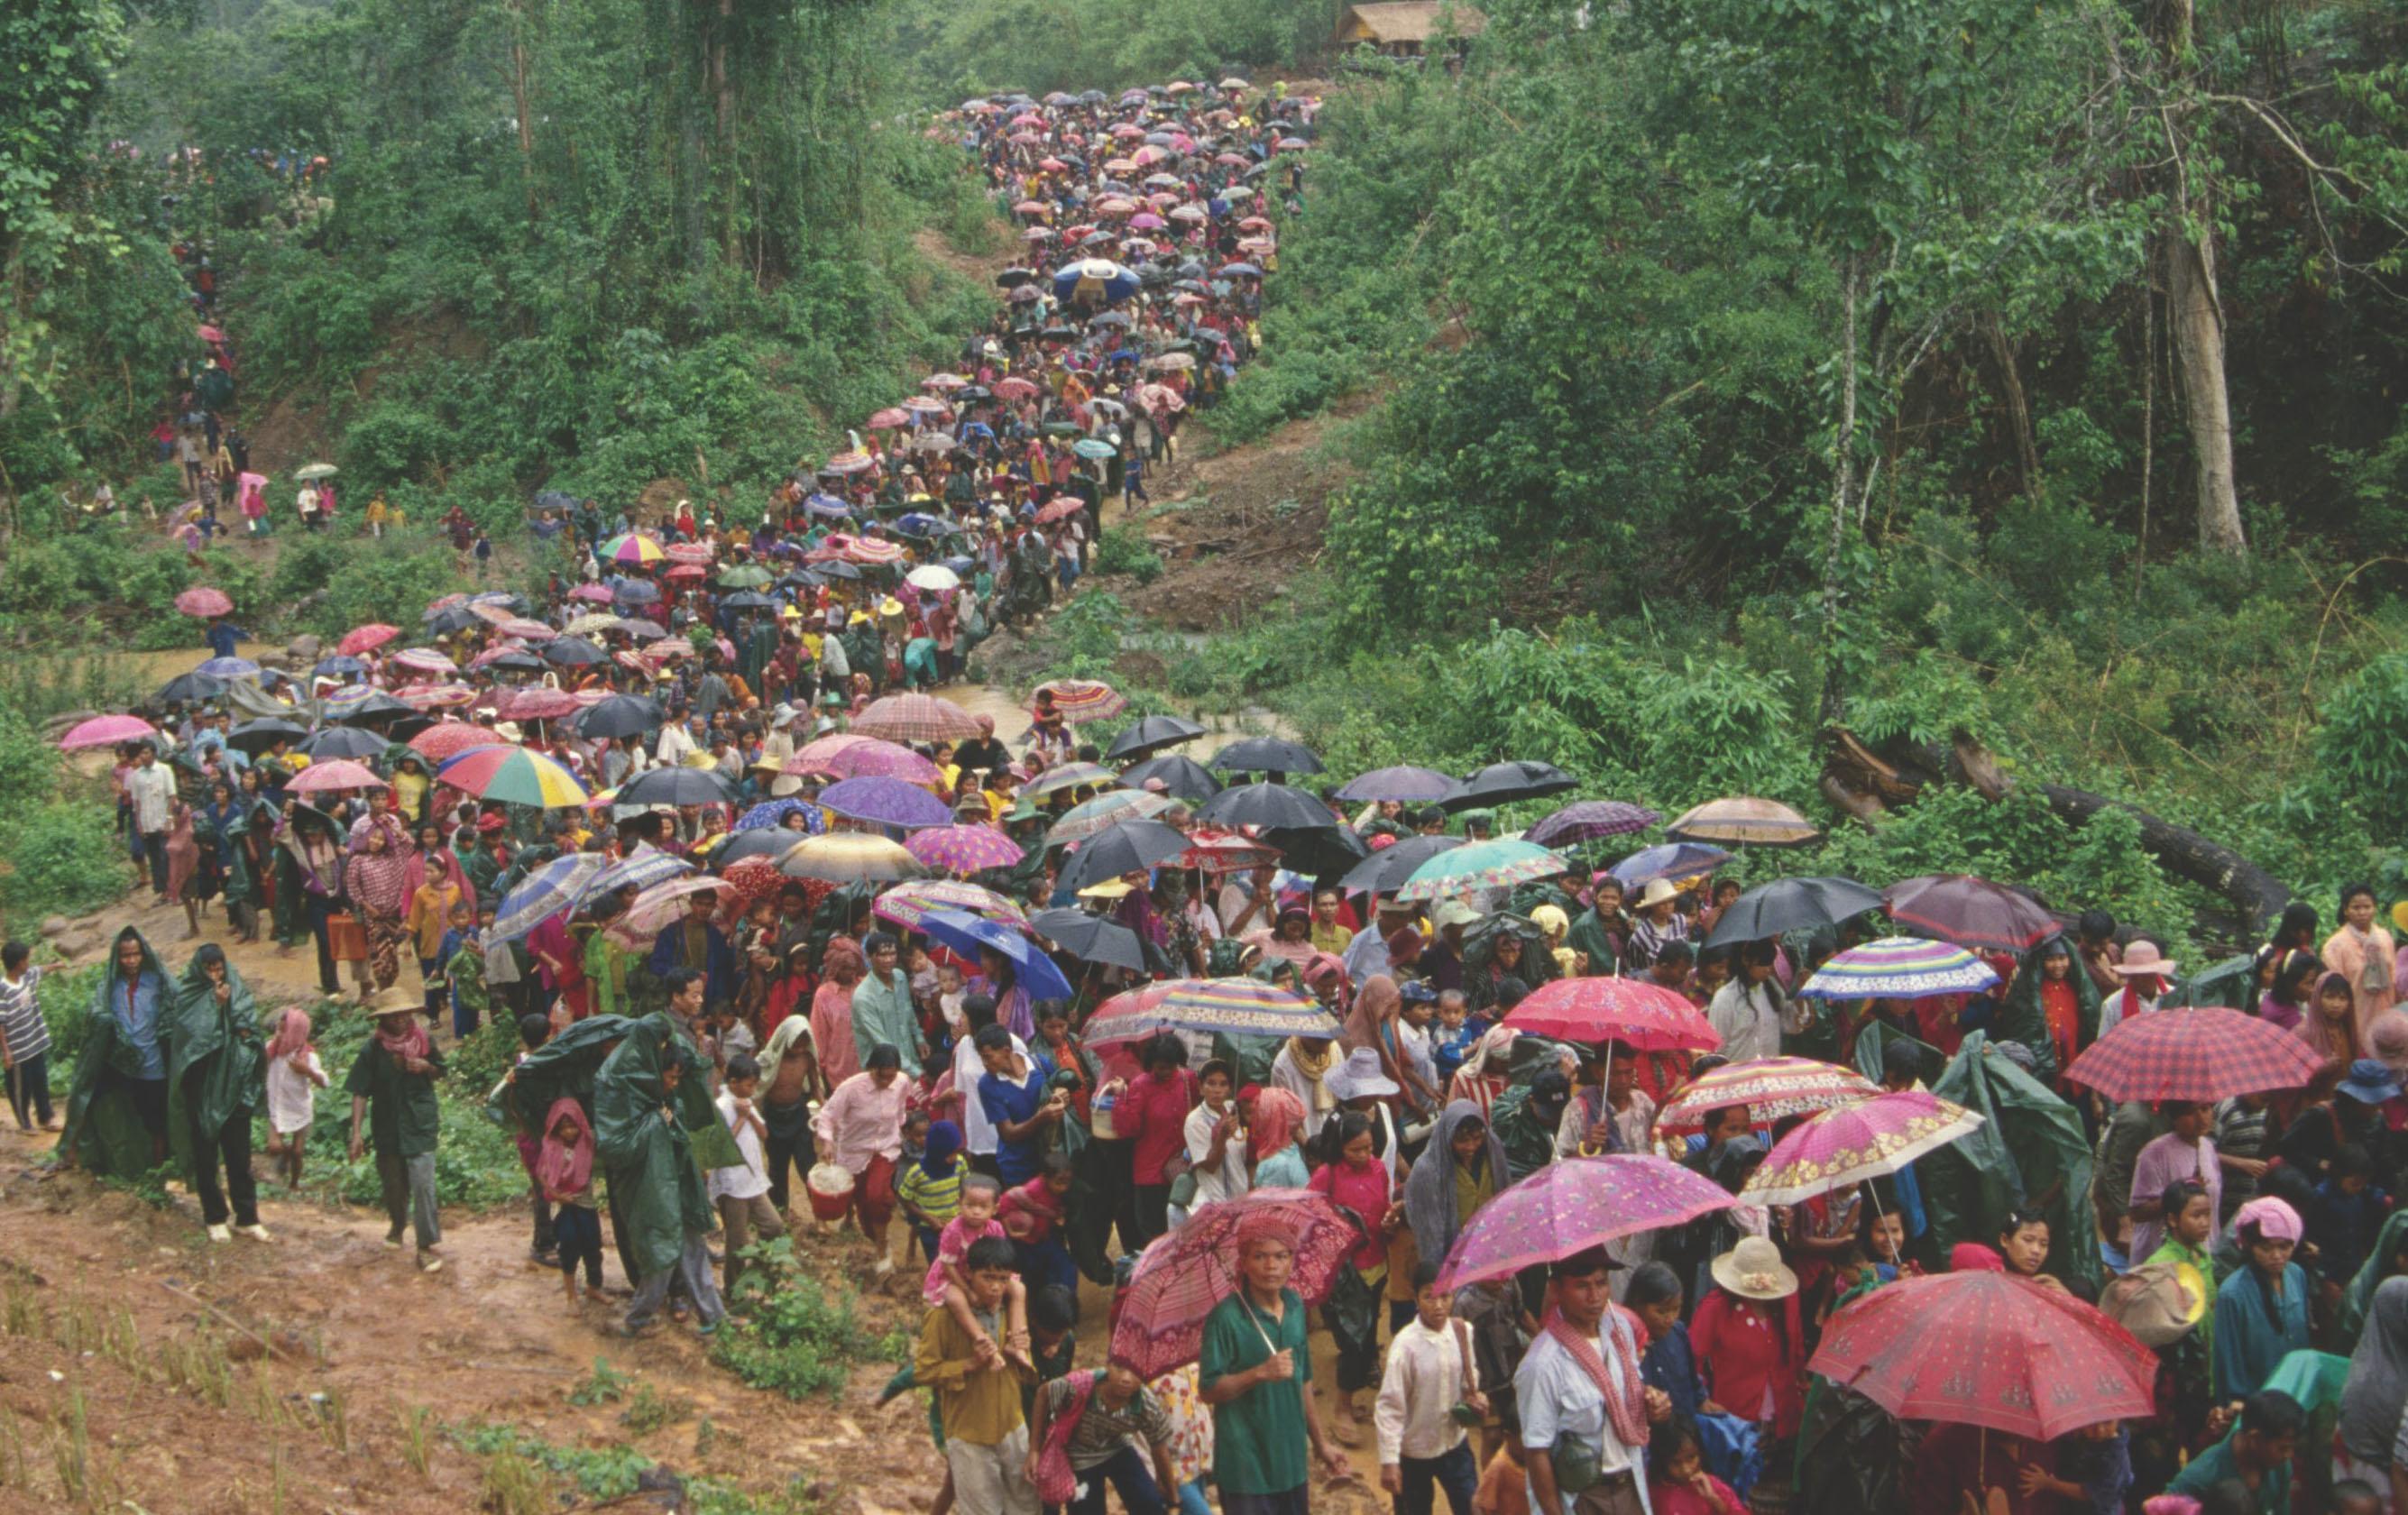 CARFMS17: Forgotten Corridors: Global Displacement & the Politics of Engagement